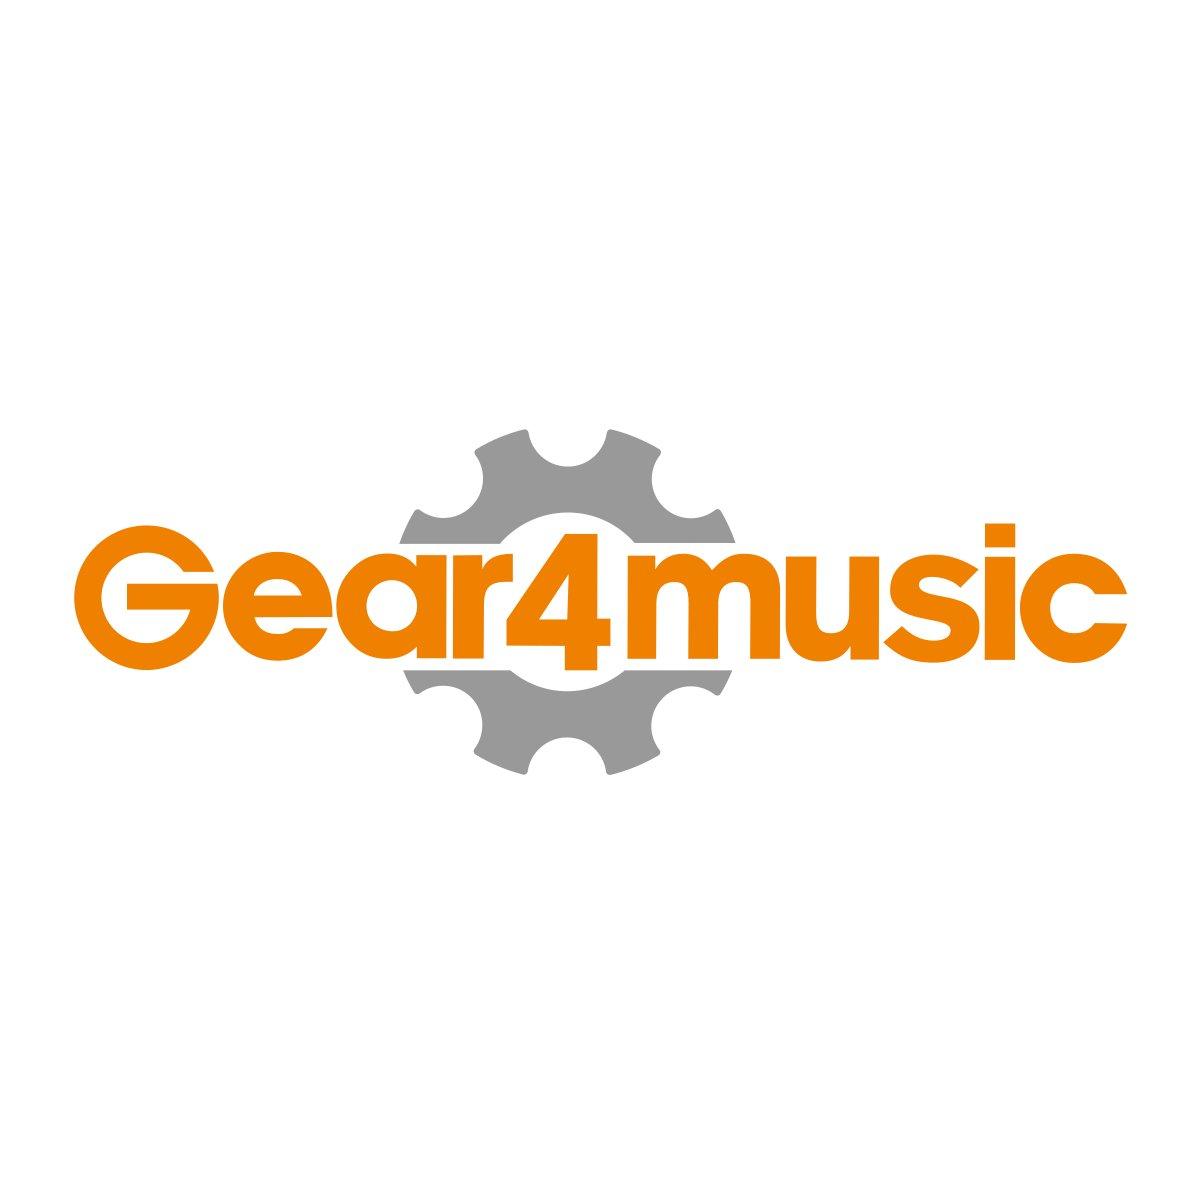 Image of 1200W Fog Machine by Gear4music